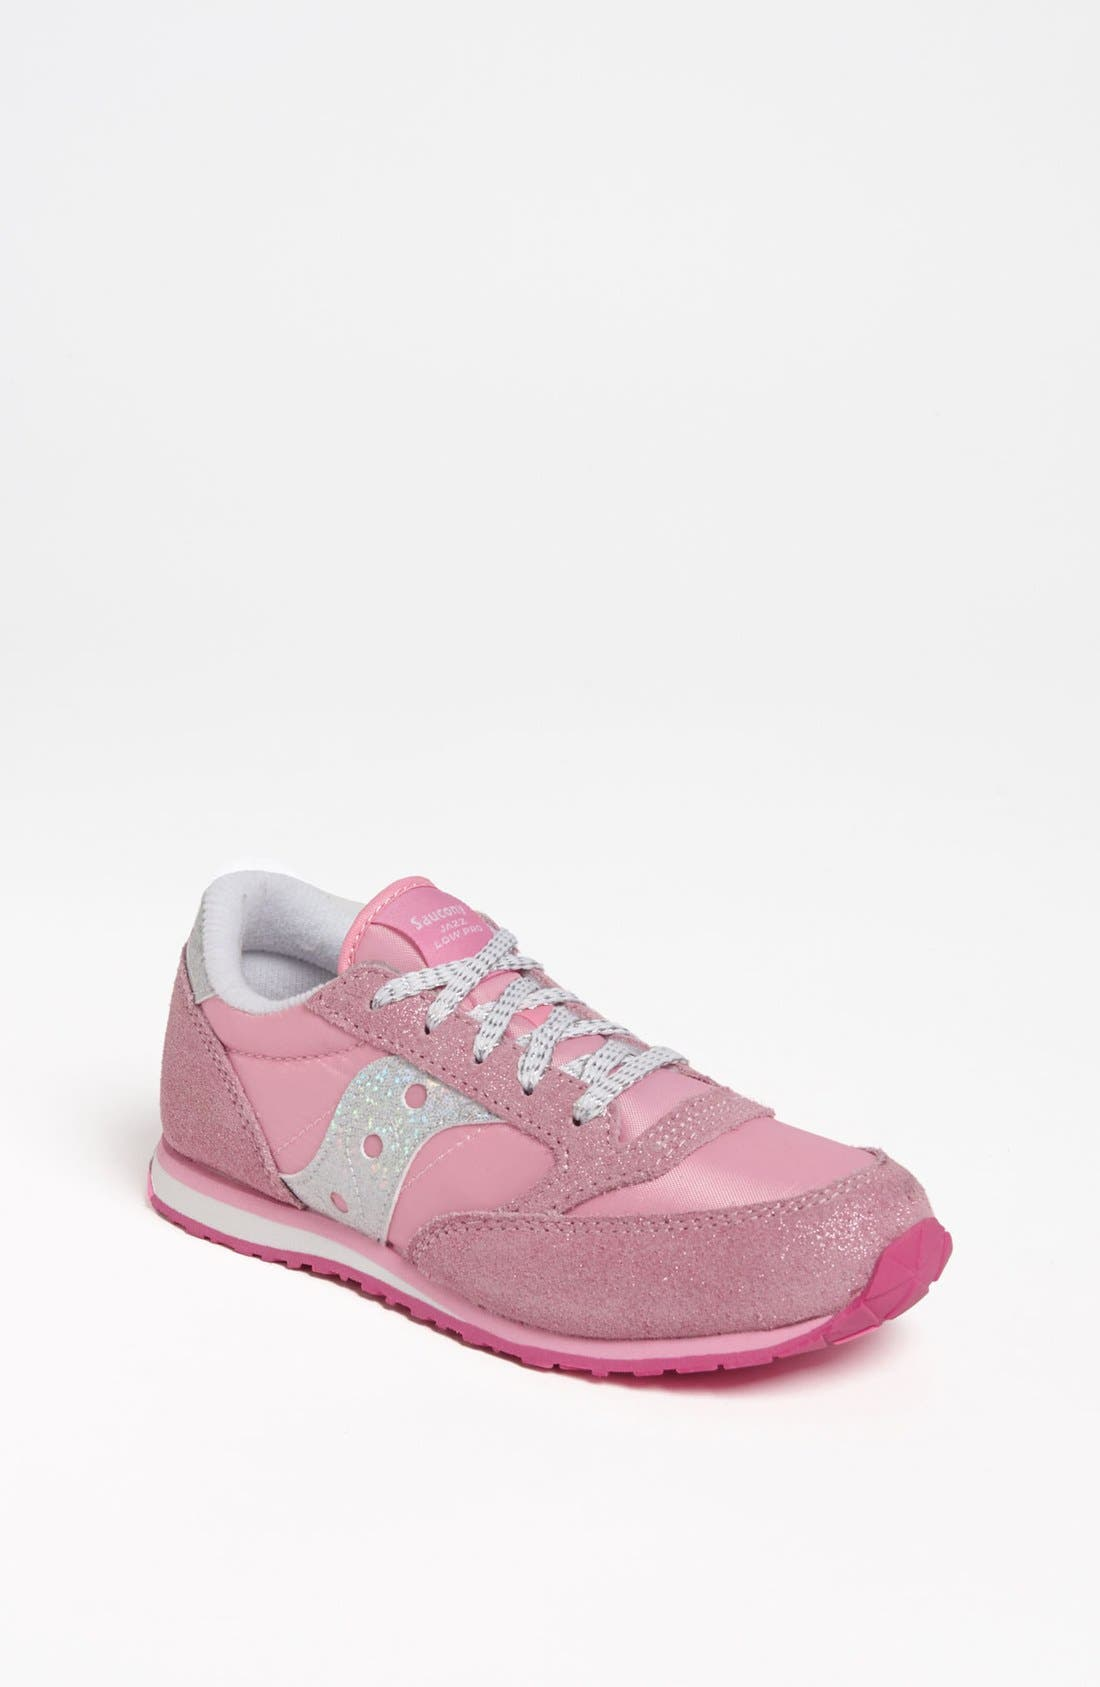 Alternate Image 1 Selected - Saucony 'Jazz - LowPro' Sneaker (Toddler & Little Kid)